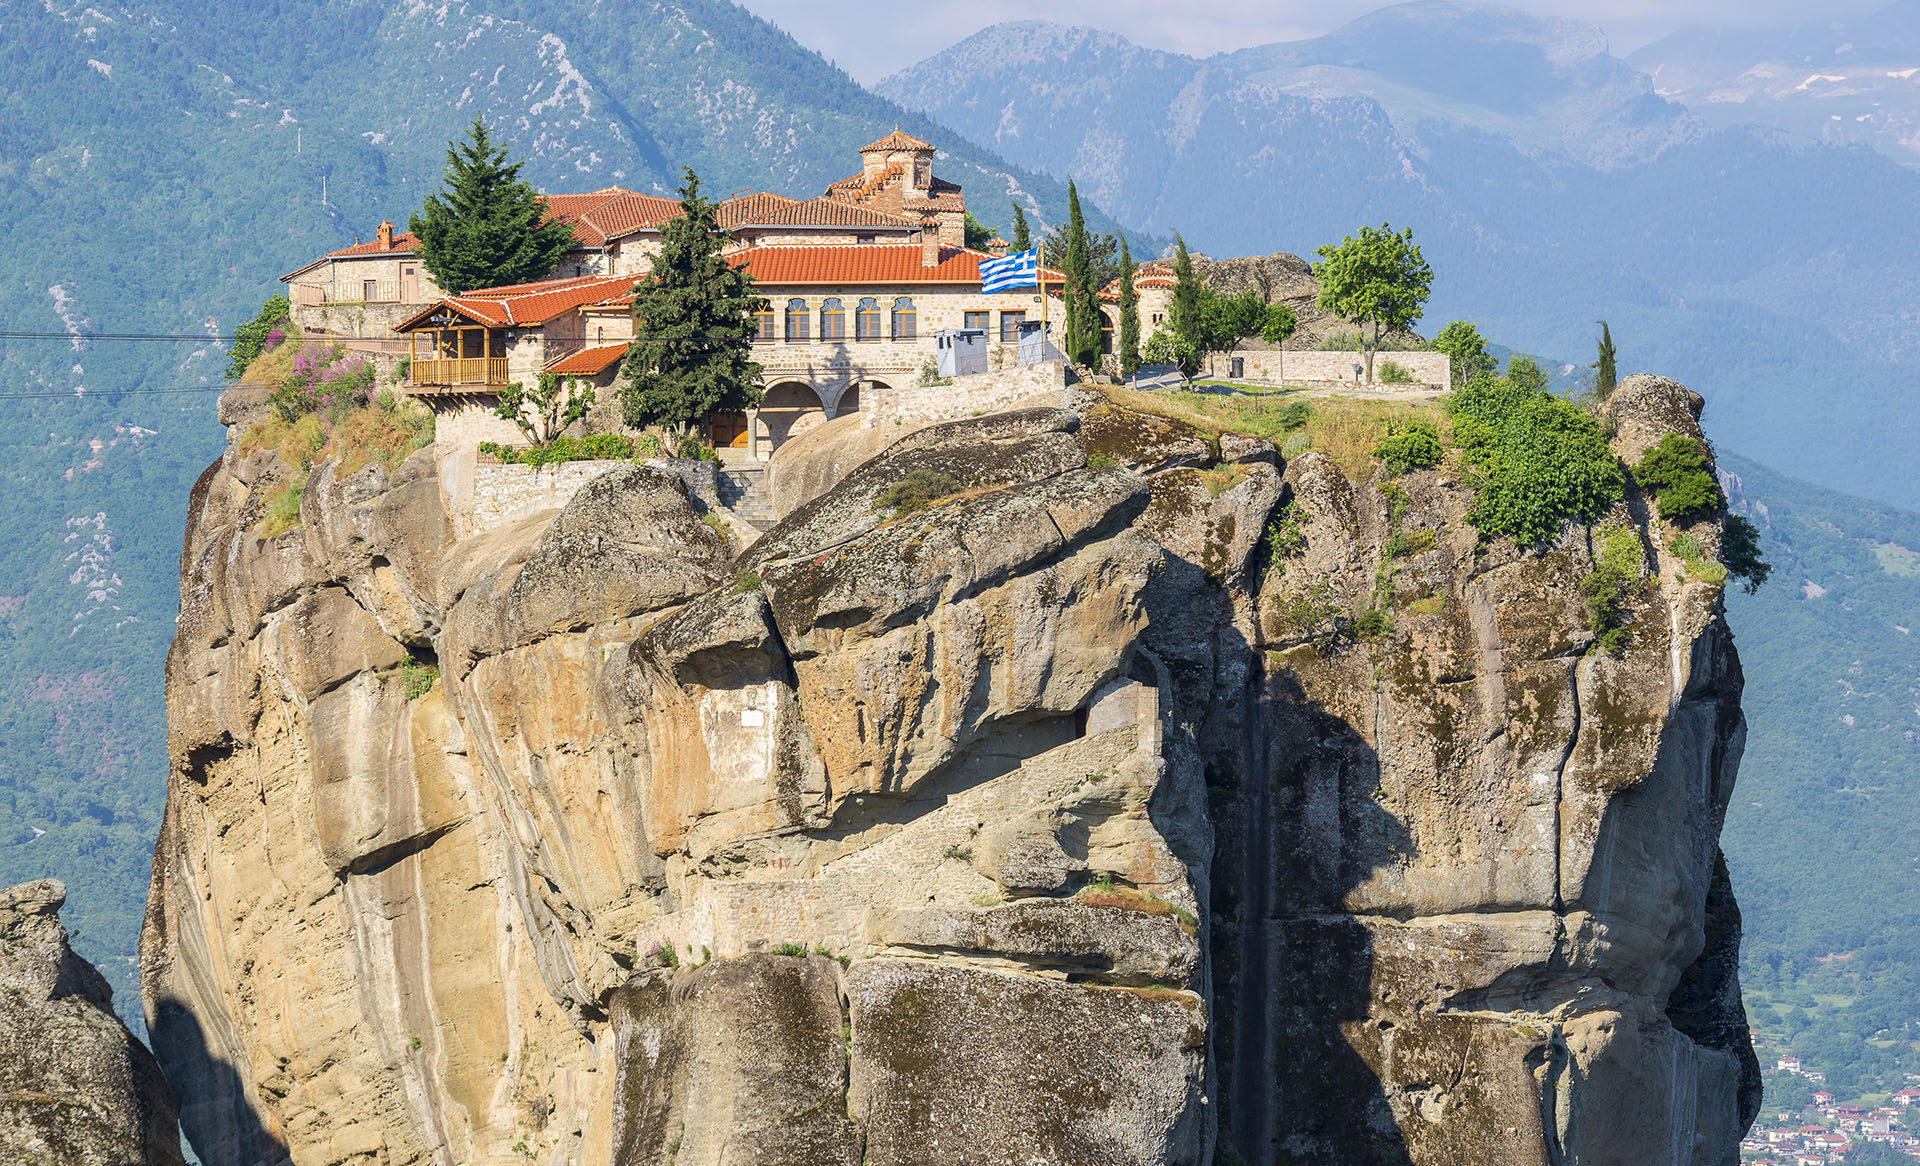 Meteora Klöster Karte.Kloster Agia Triada Infotourist Meteora